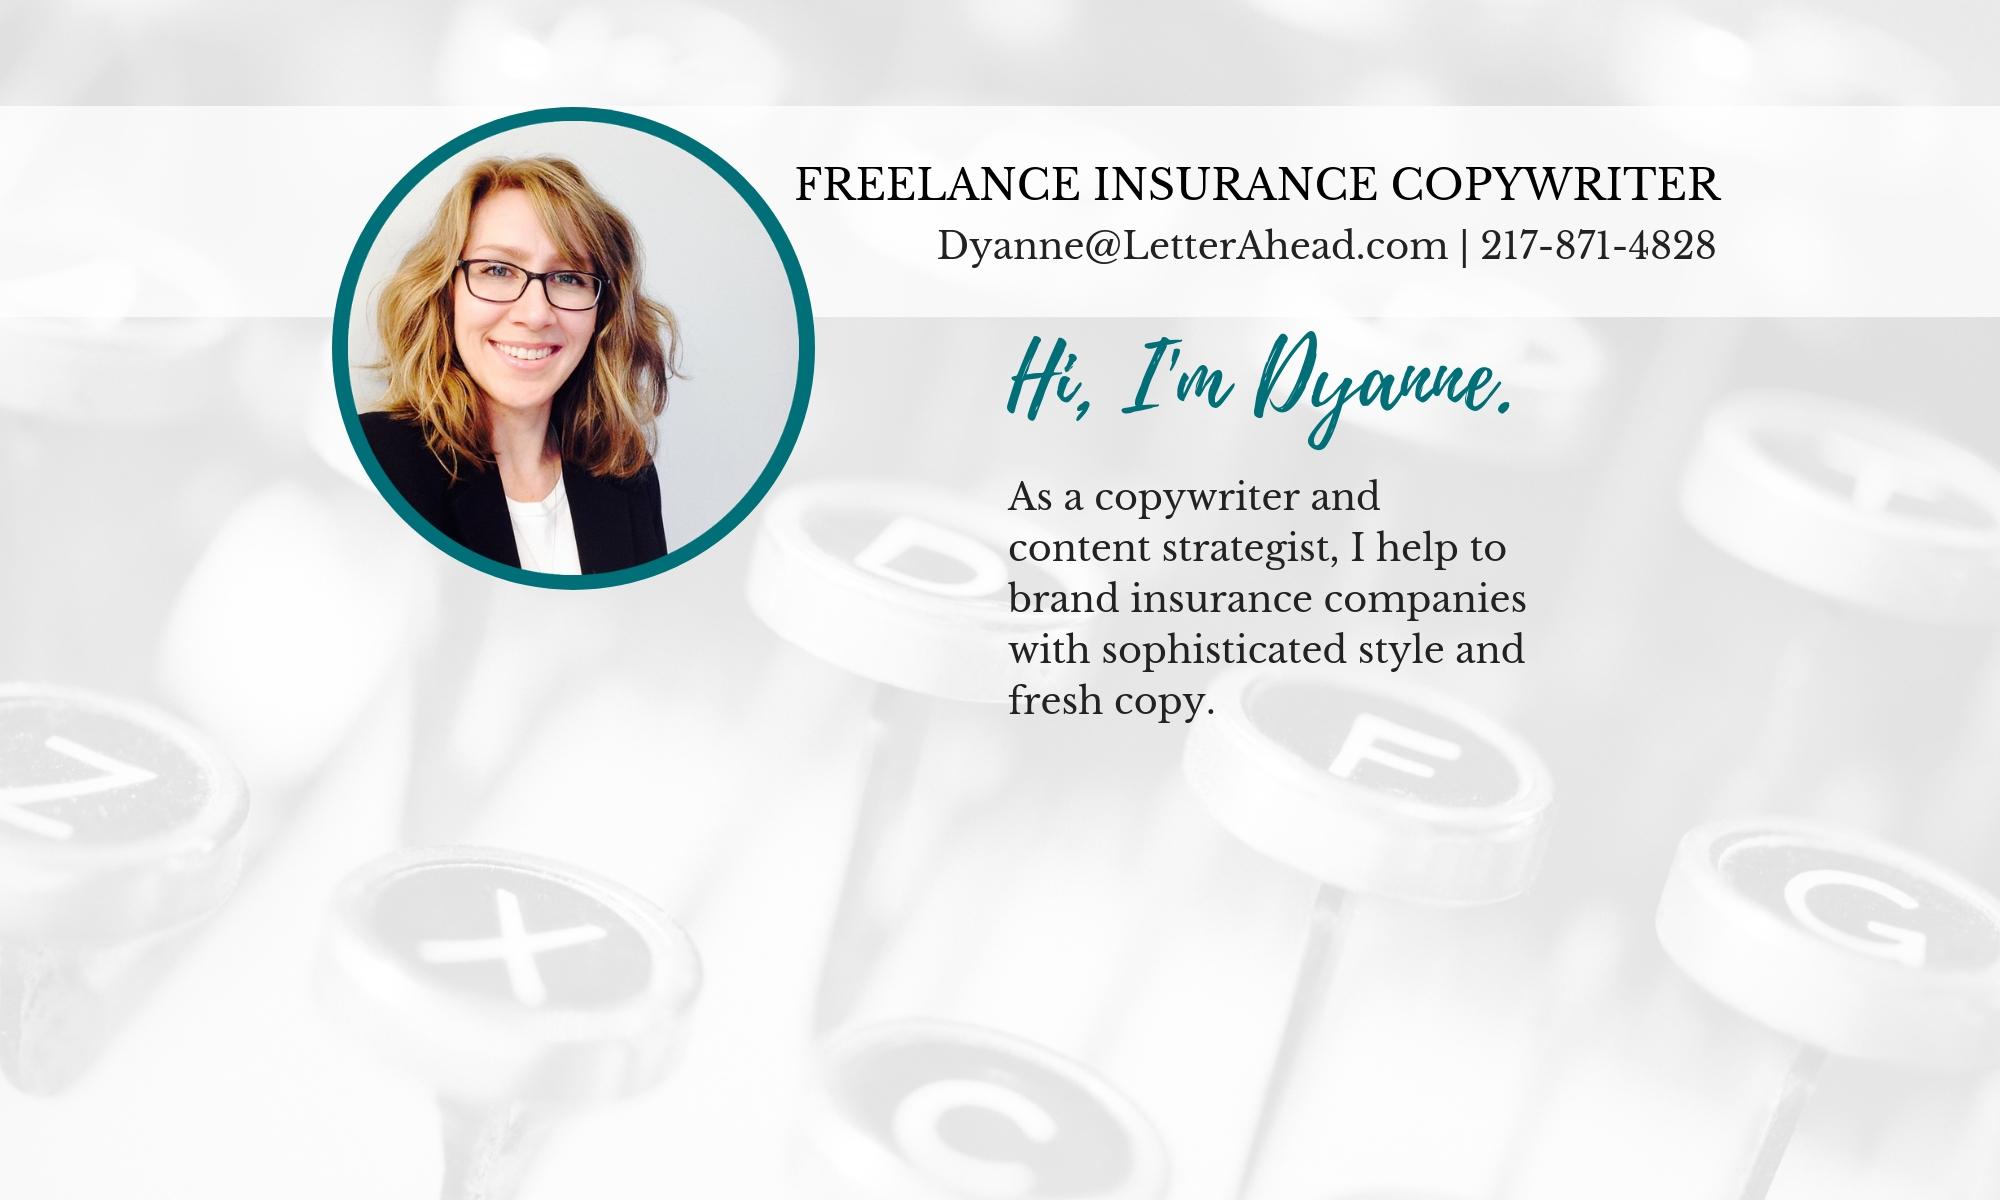 Dyanne Harvey | Freelance Insurance Copywriter